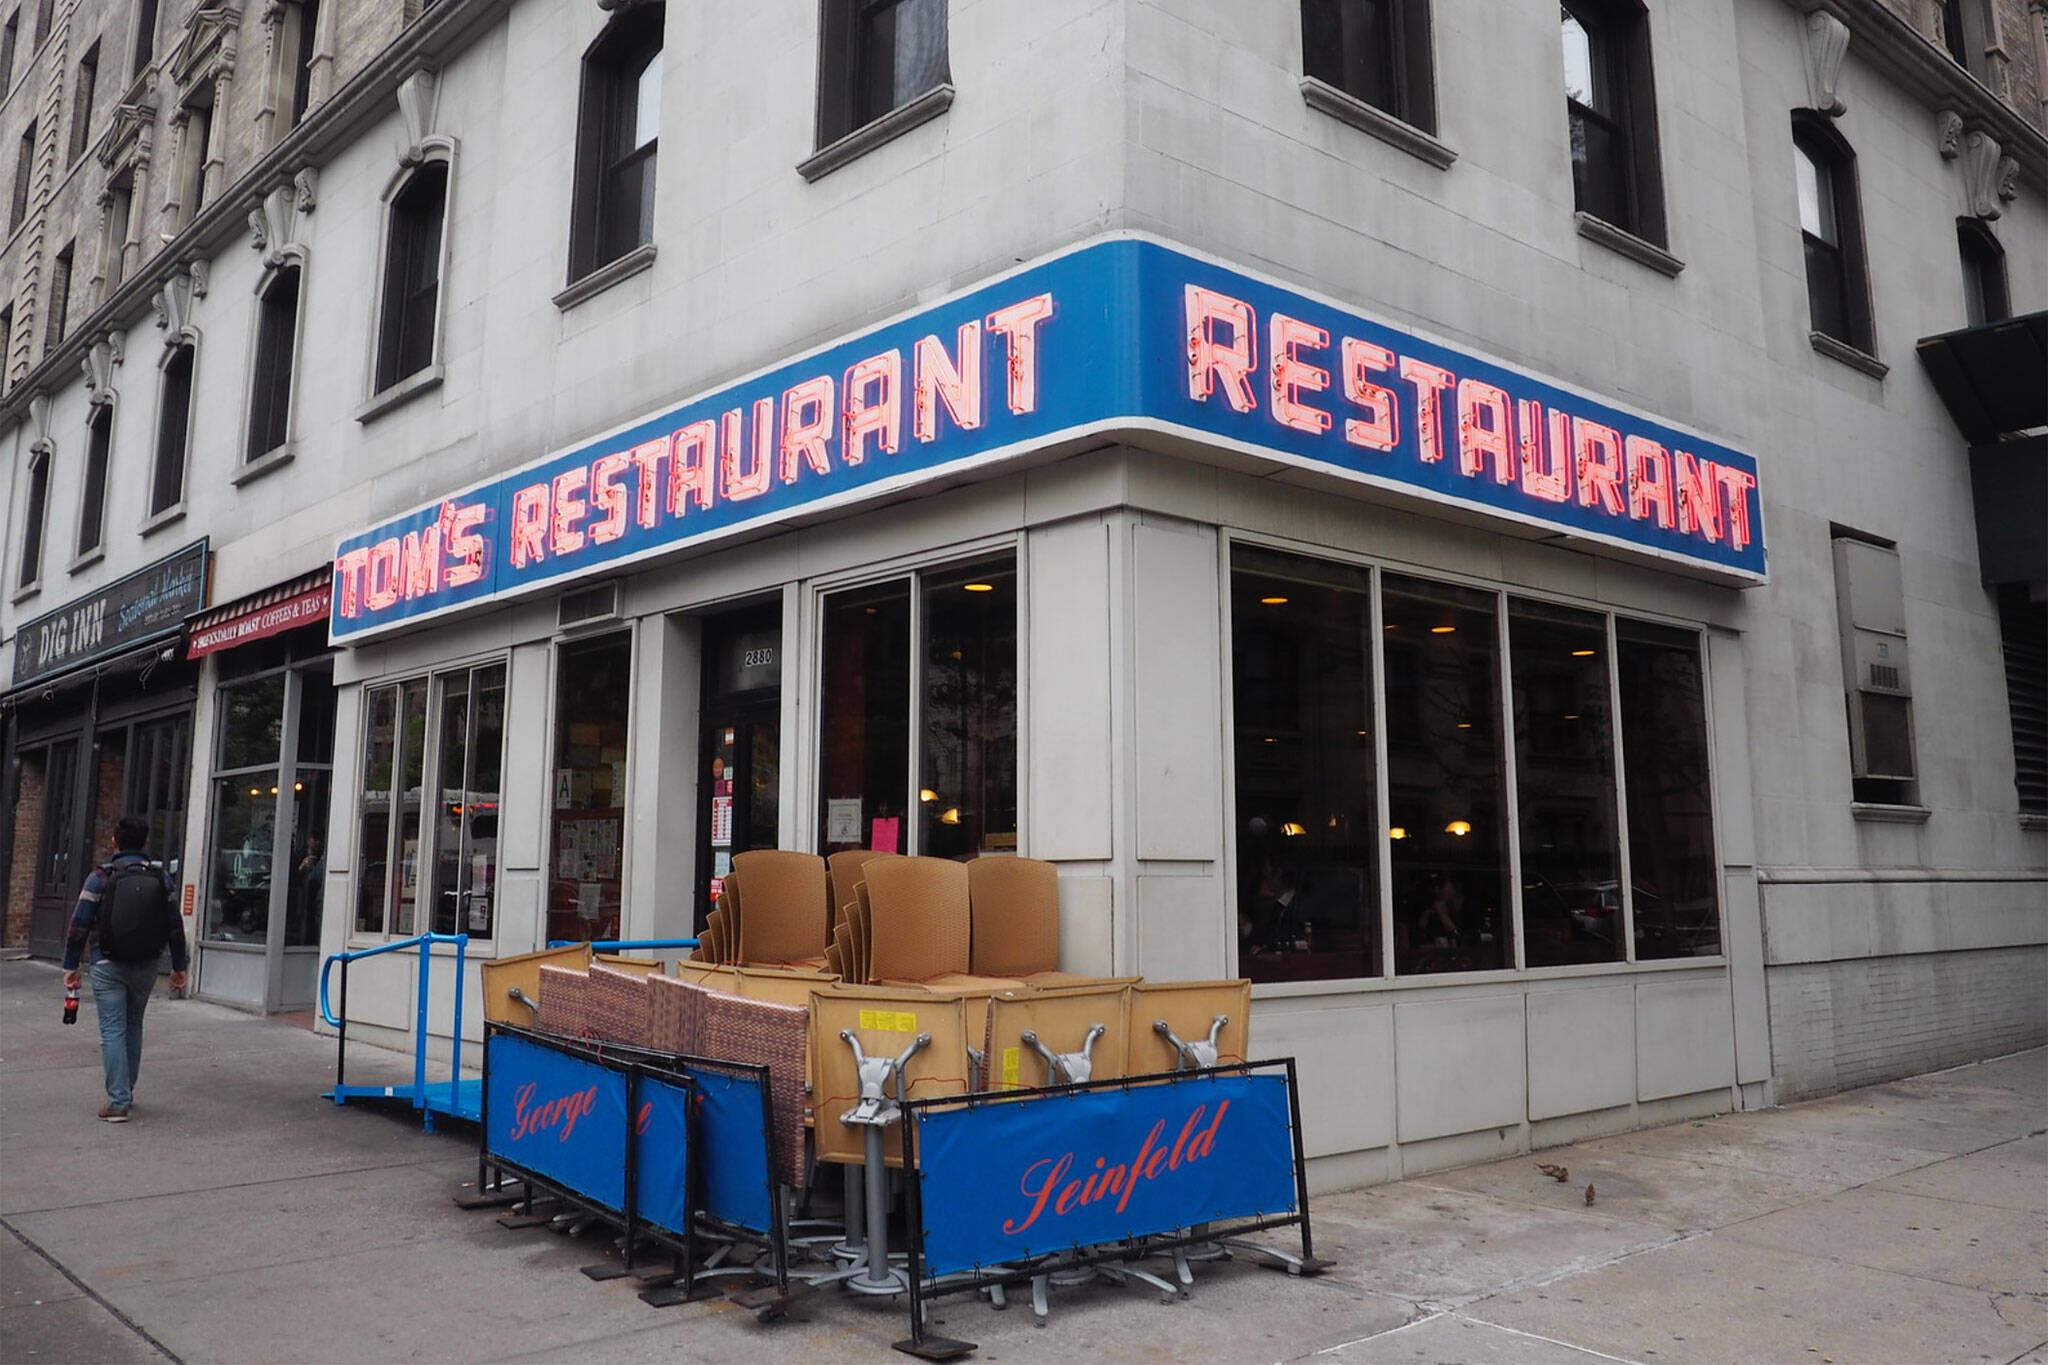 seinfeld restaurant toronto